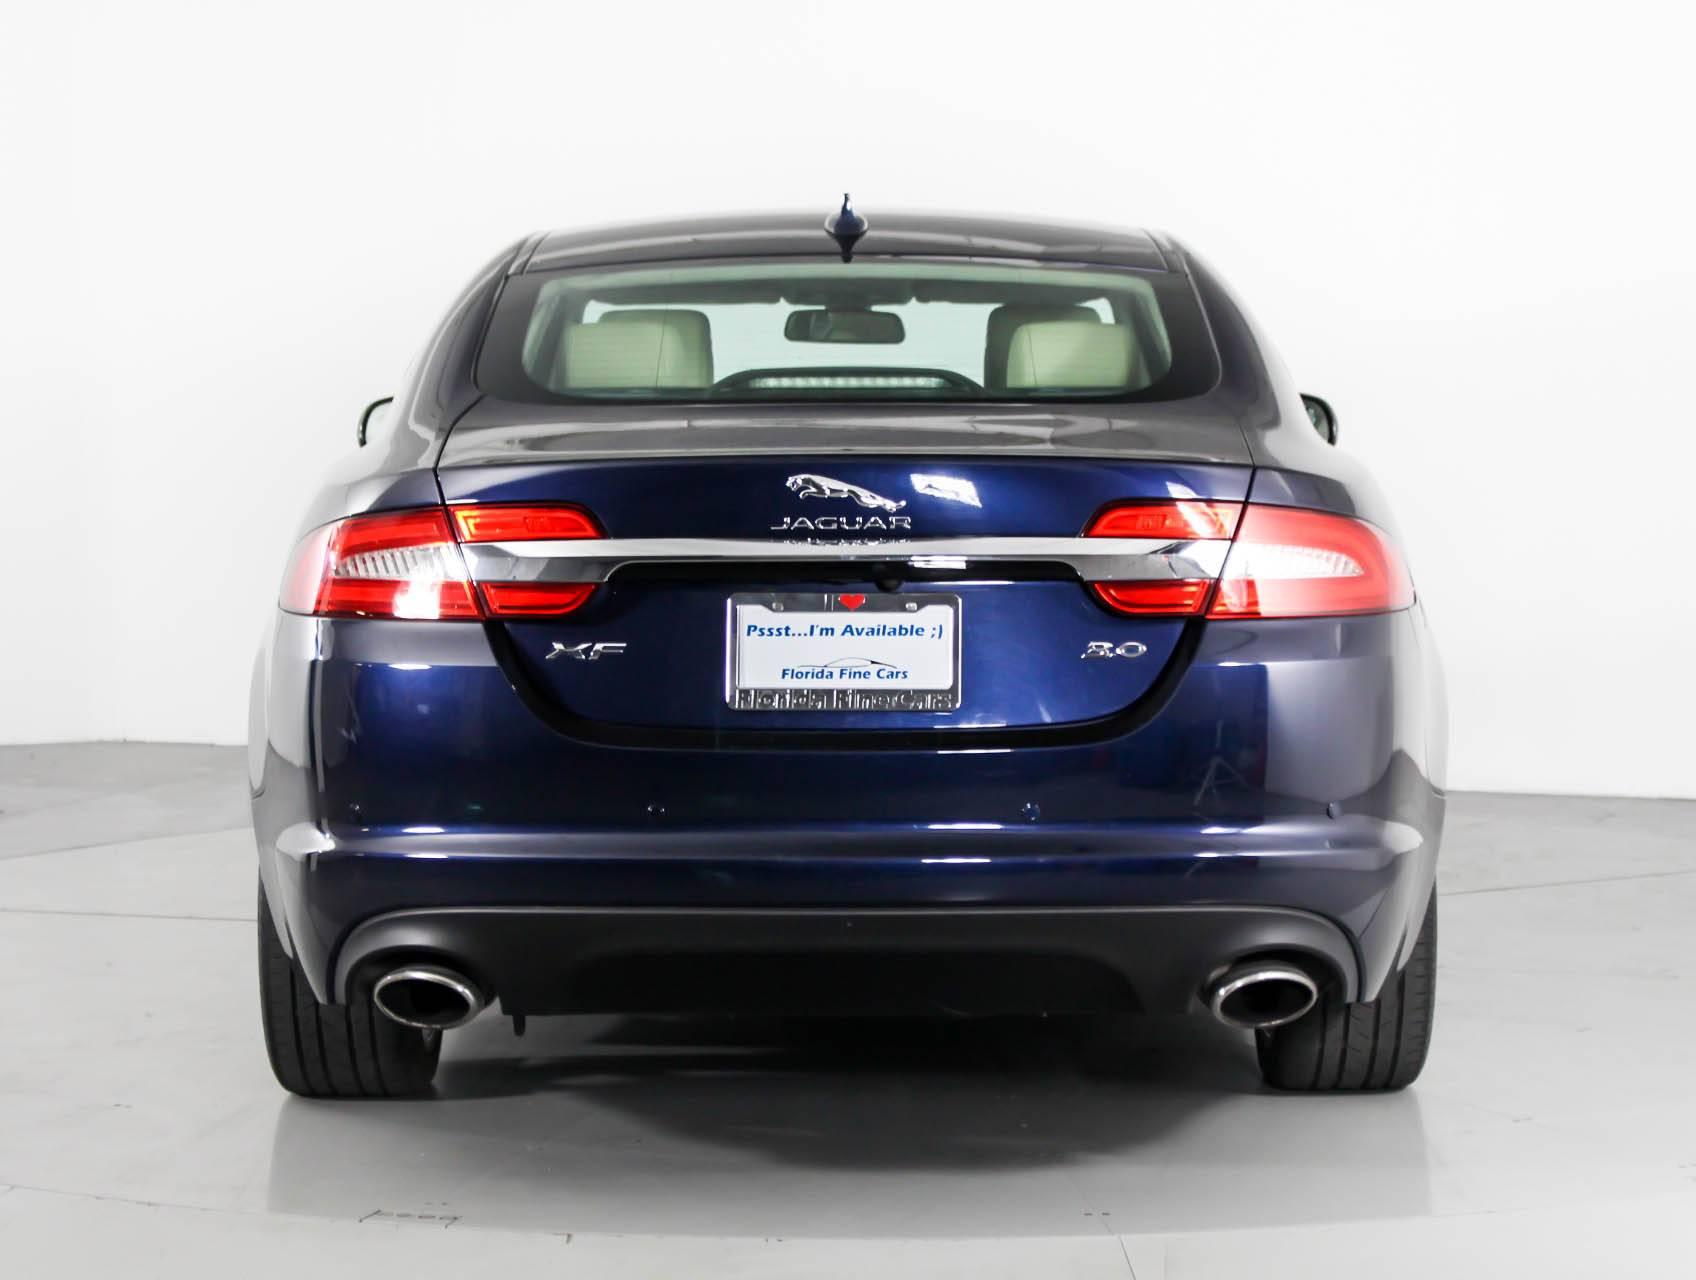 select virginia va premium t sedan in beach xf revo automotive city jaguar